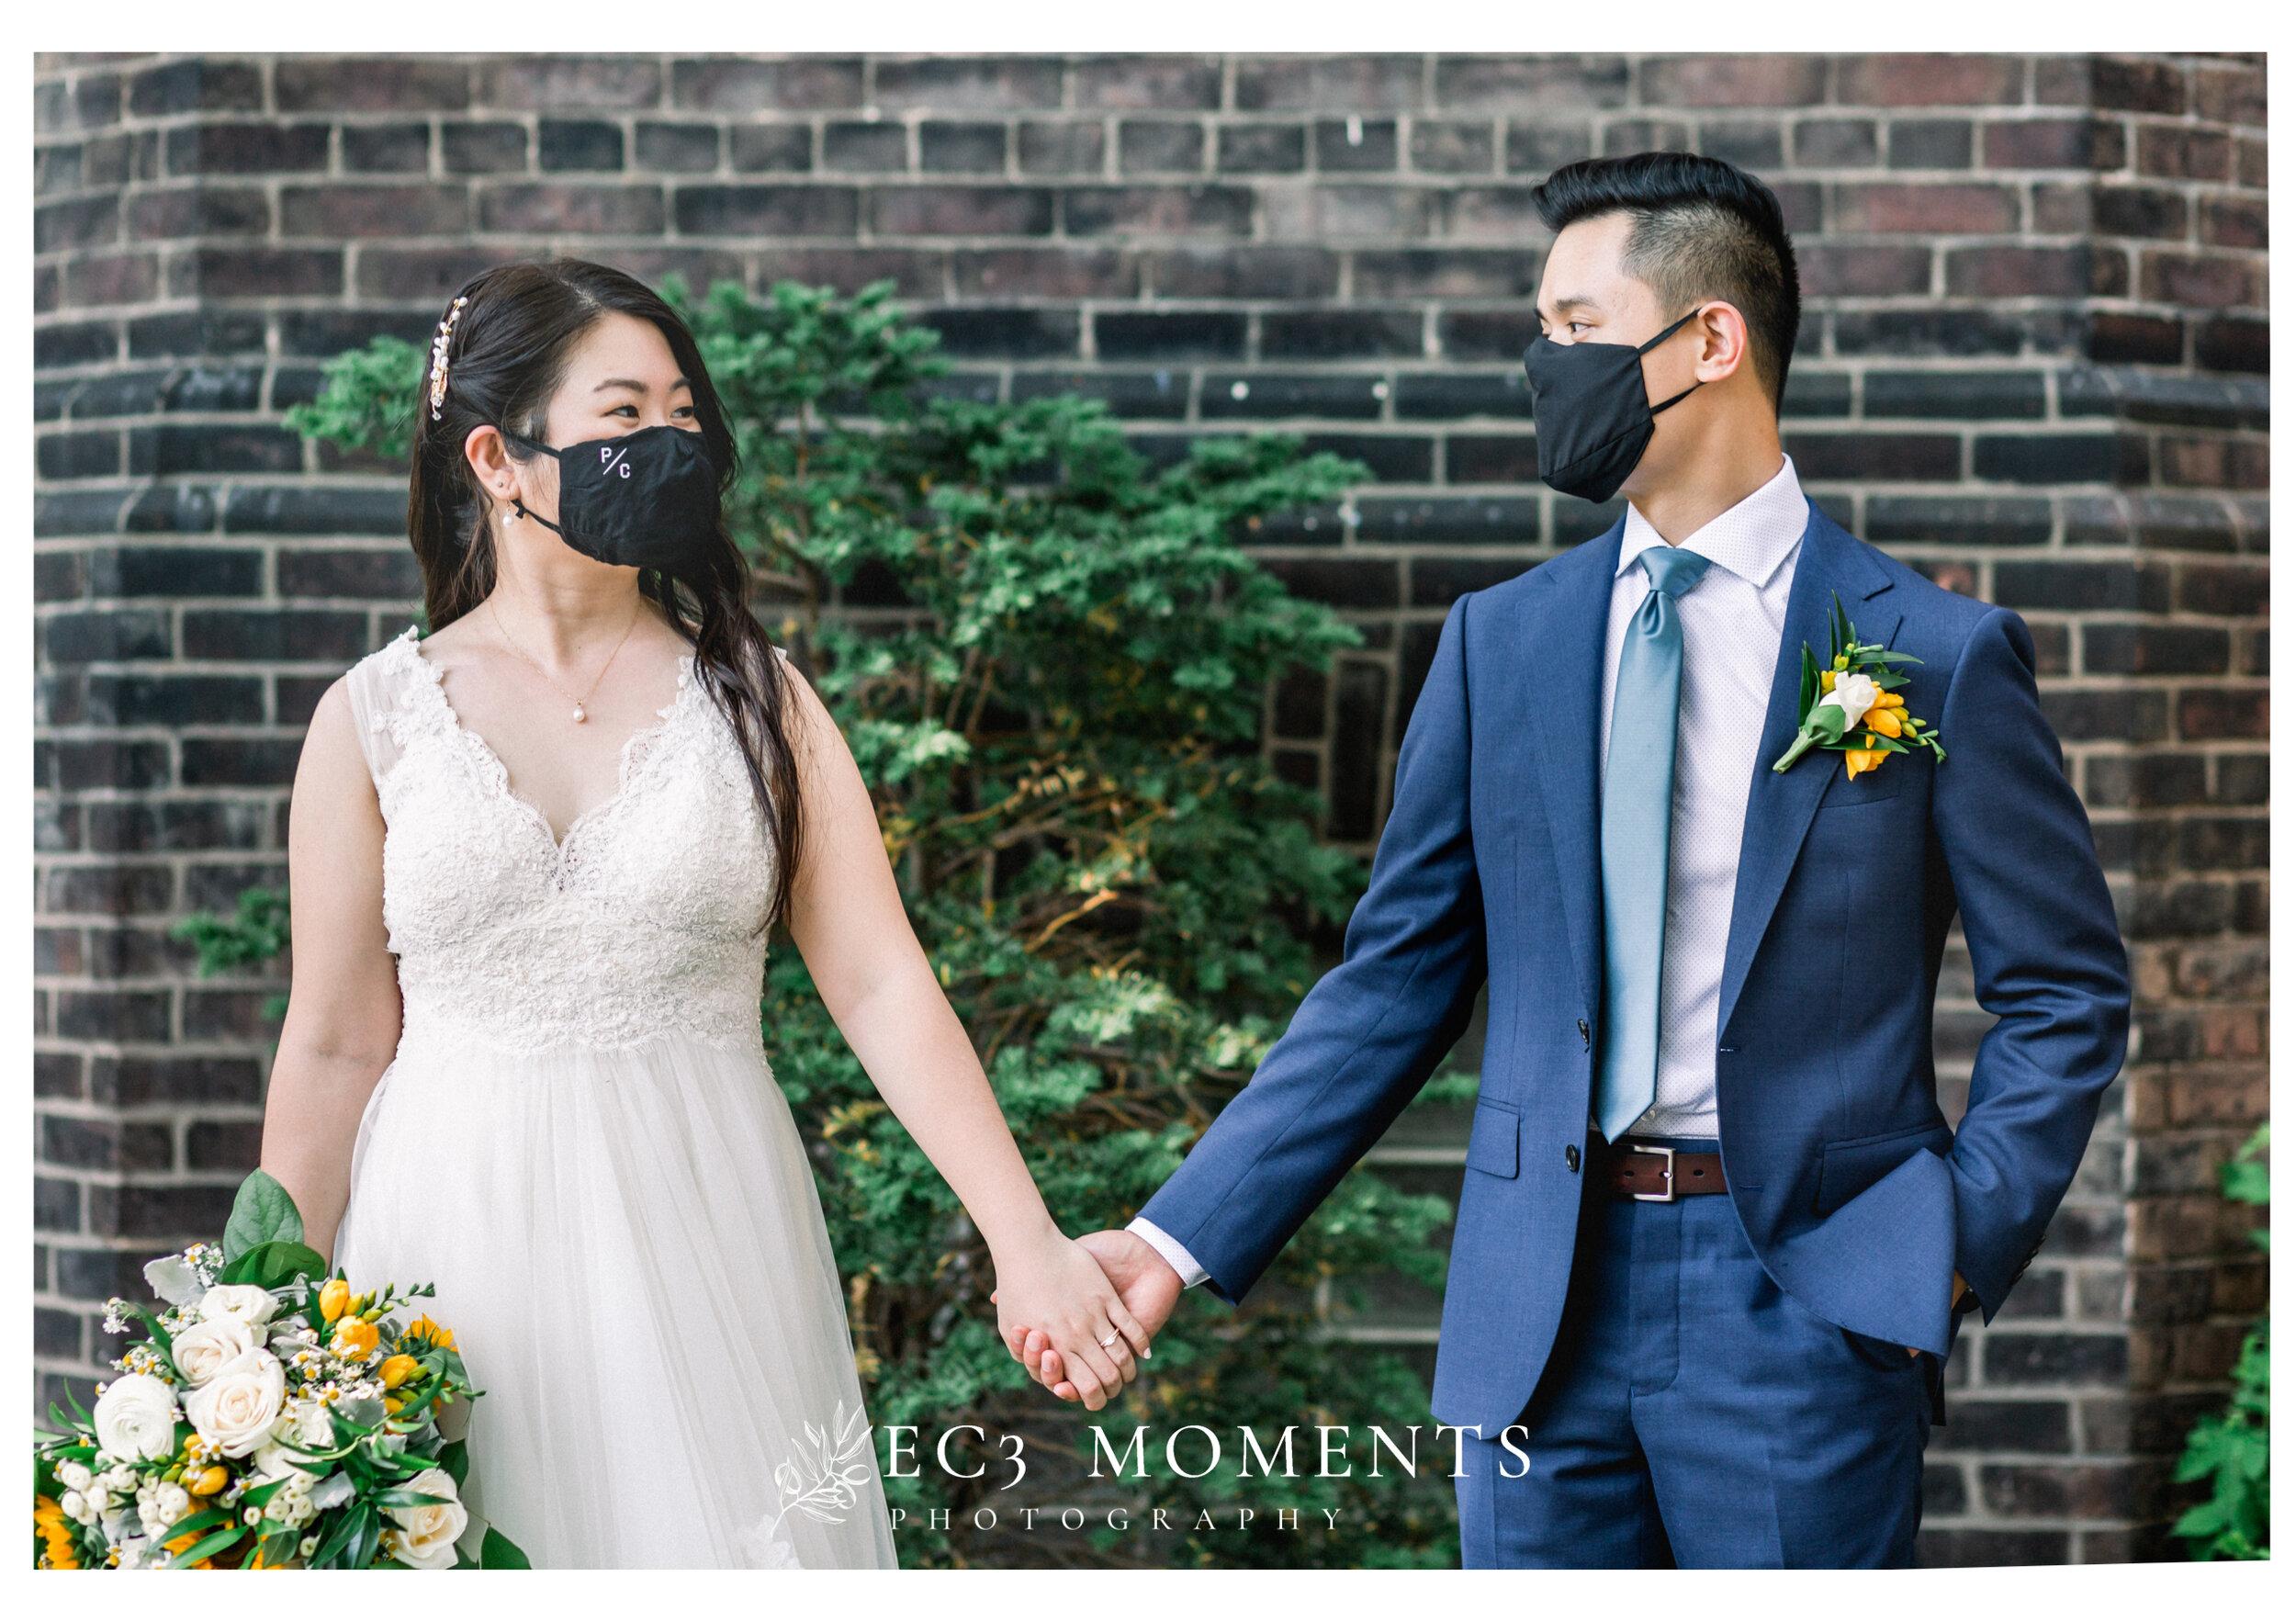 Toronto Wedding Photographer Ec3 Moments